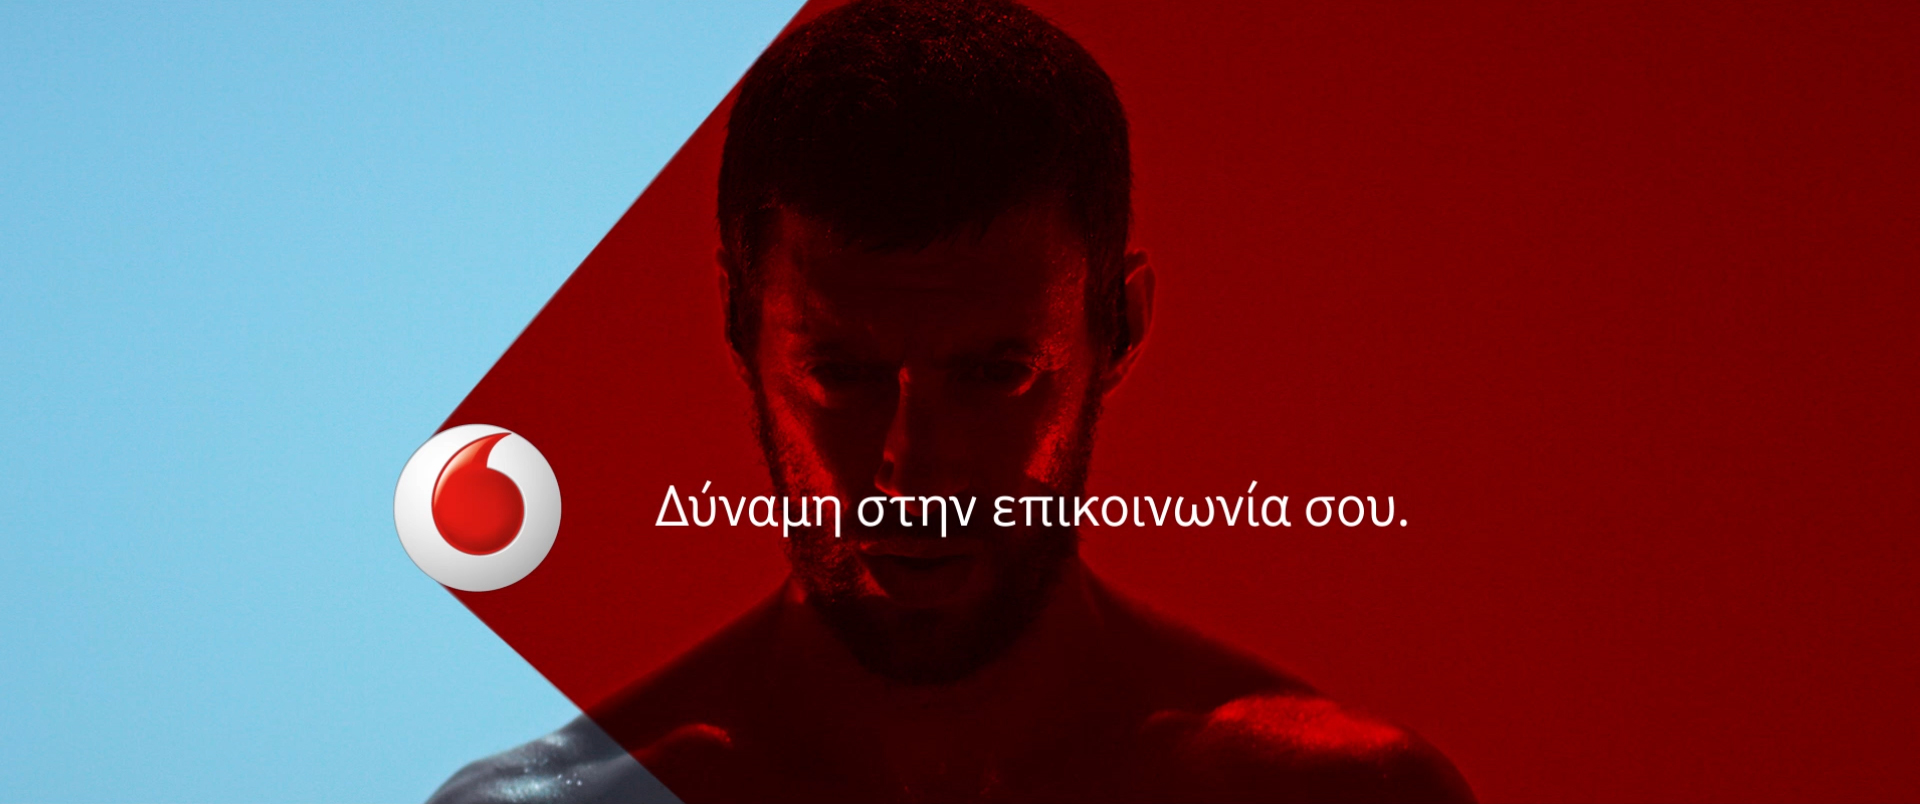 cyta_hero.jpg